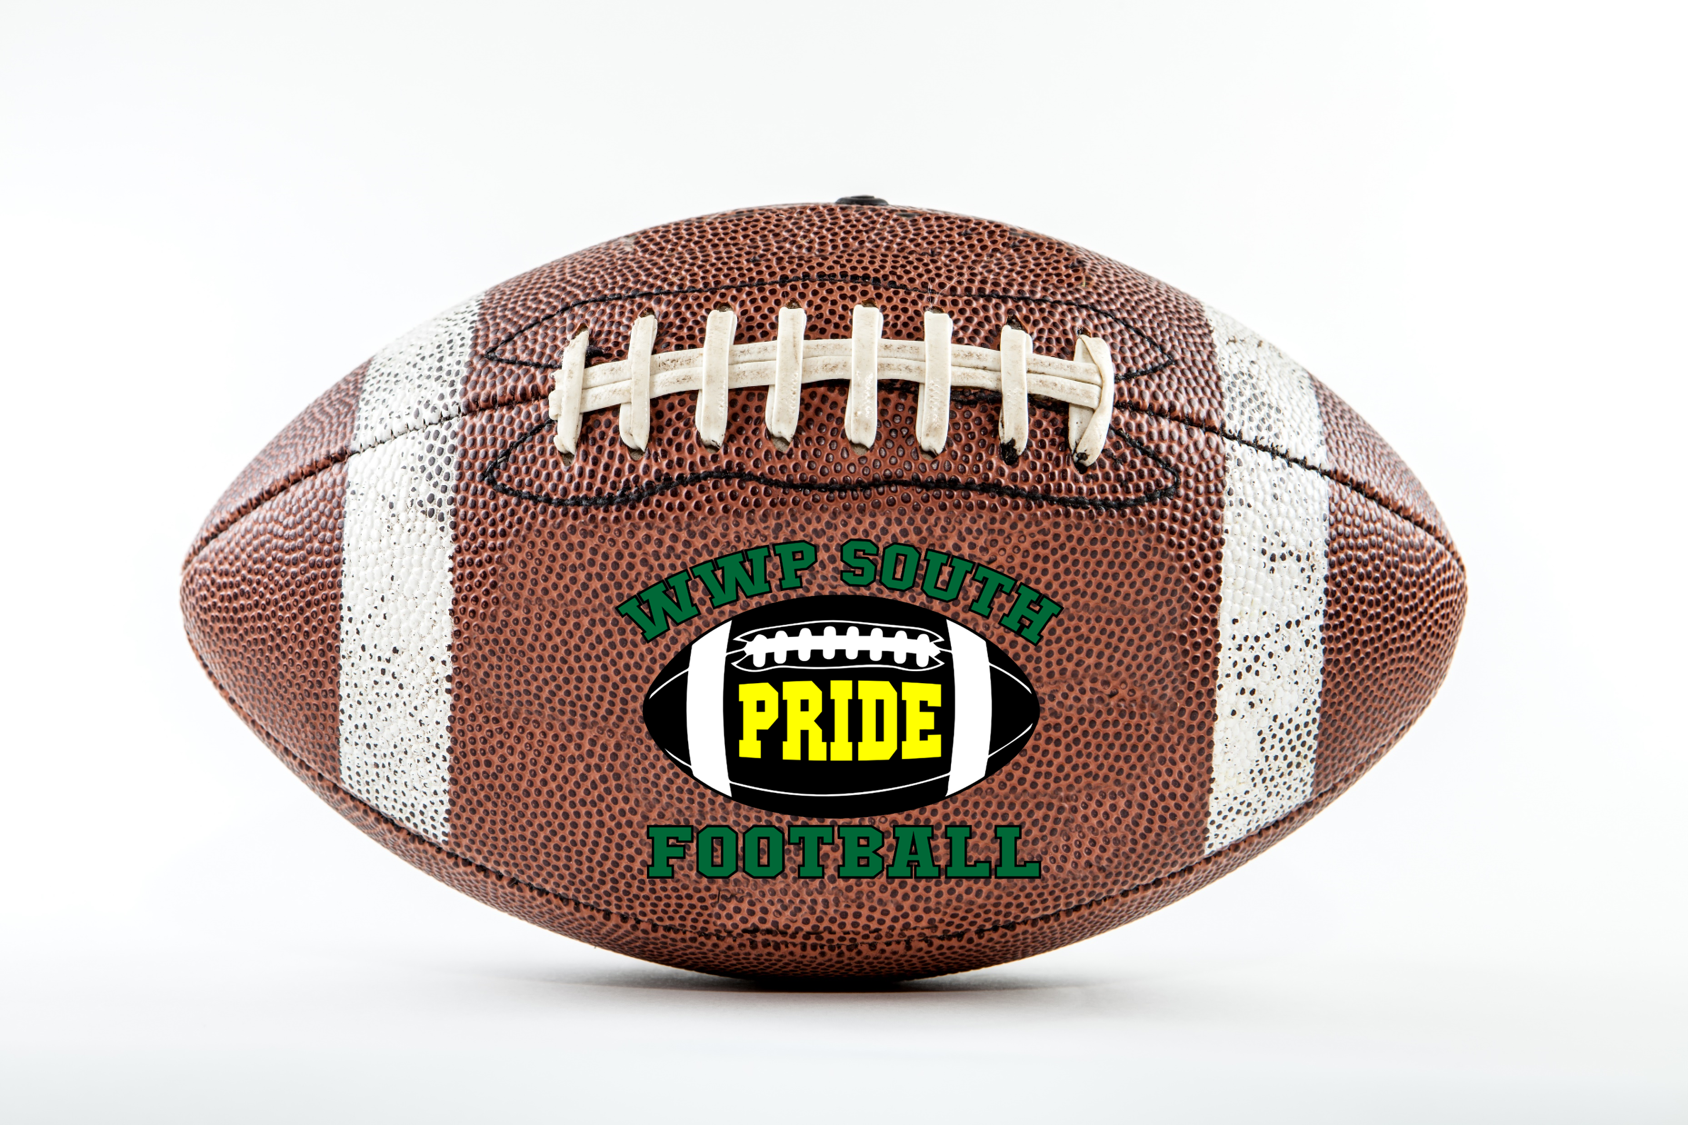 wwp-football-pride.png